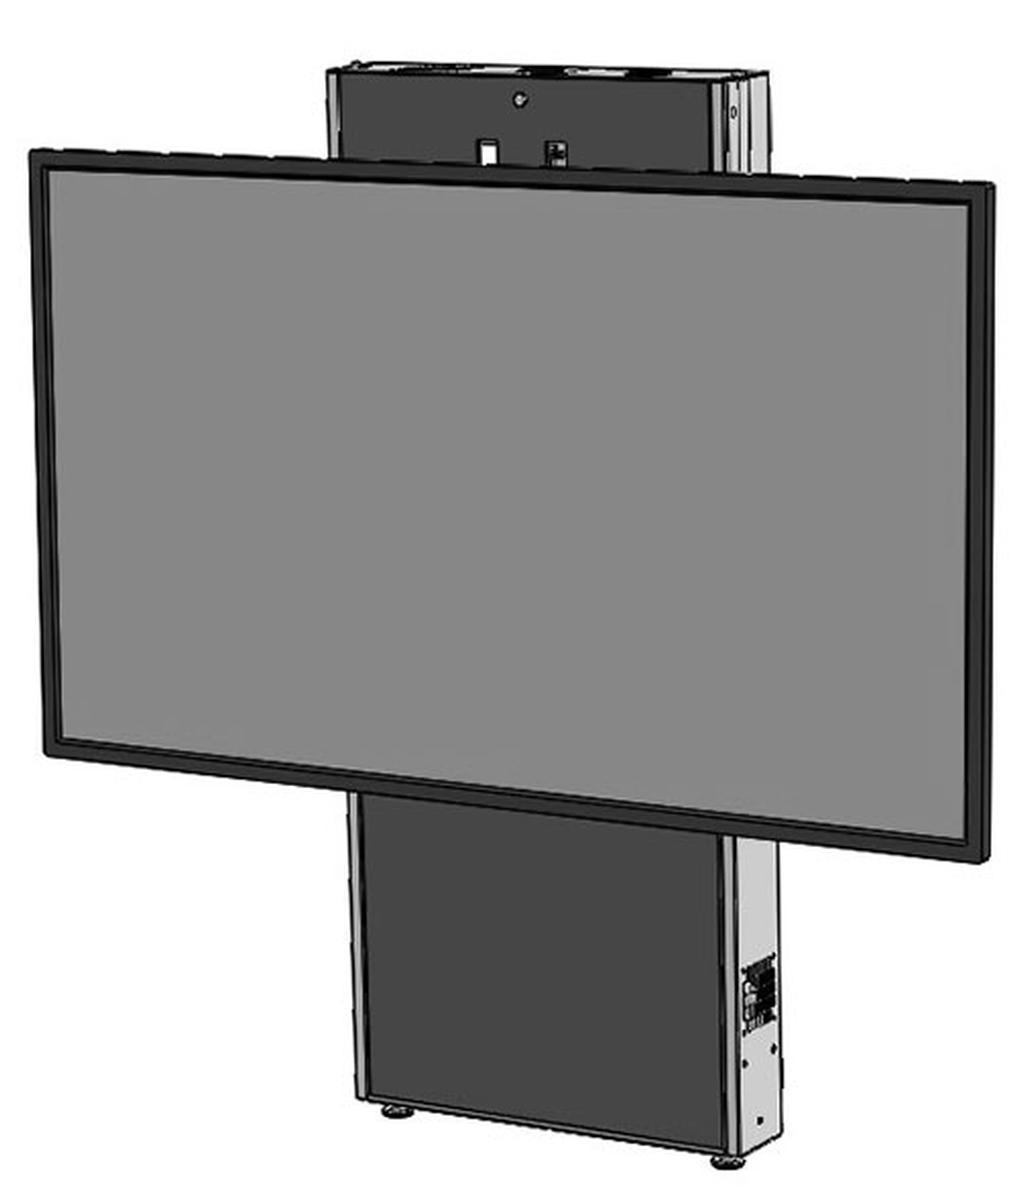 Audio Visual Furniture International Inc. - LFT7000WM-CS70